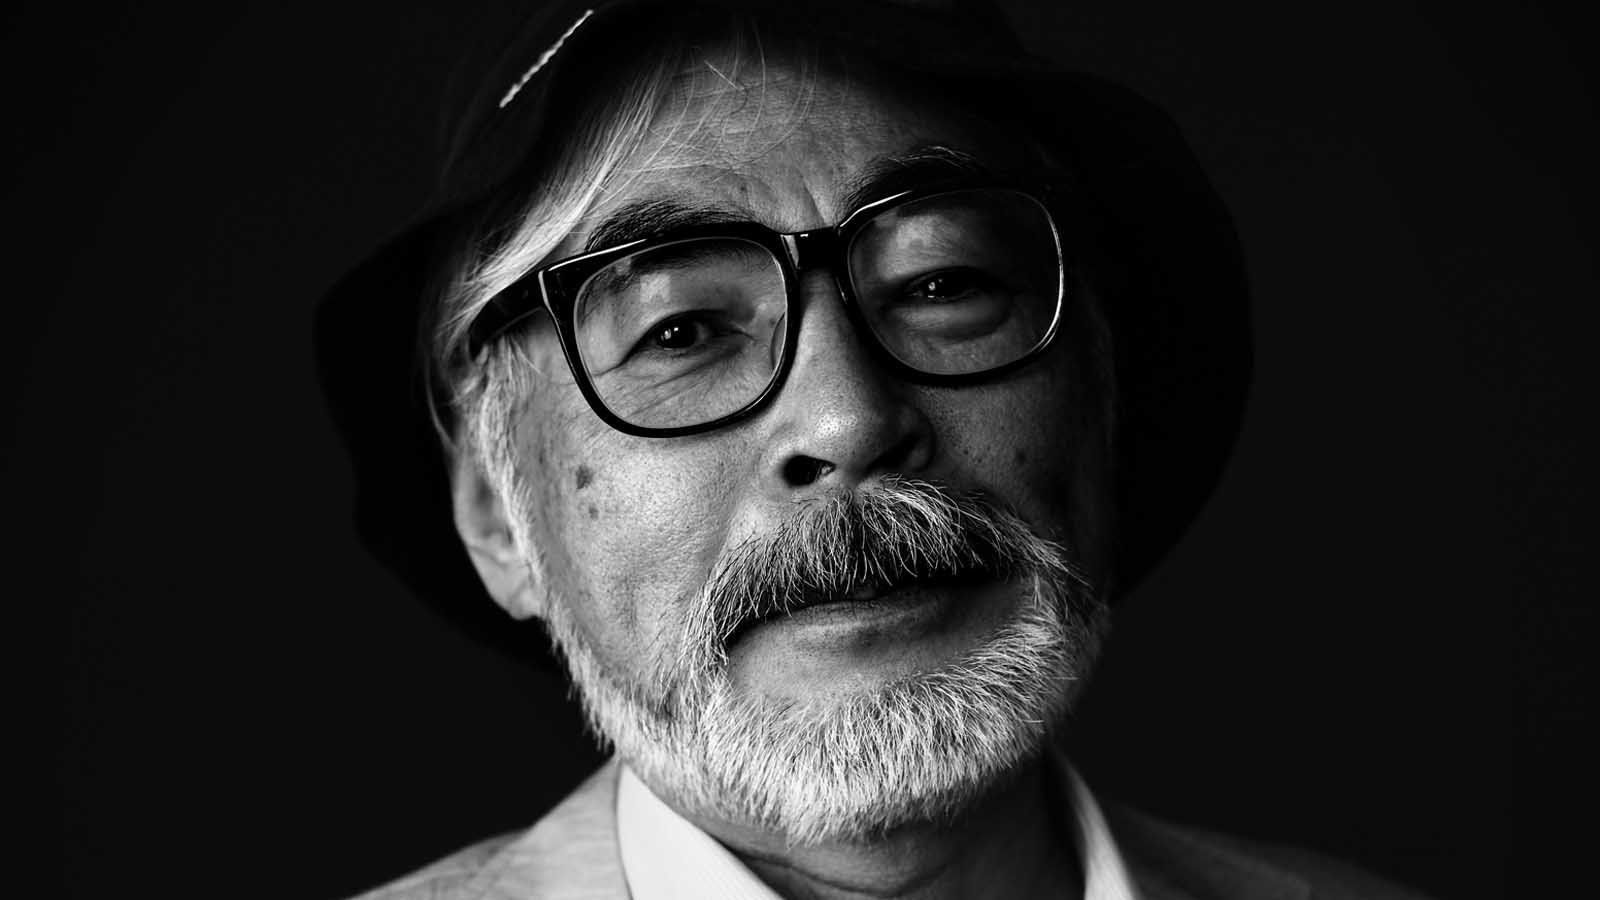 Q&A Hayao Miyazaki isn't making features but is at work on manga http://www.latimes.com/entertainment/envelope/moviesnow/la-et-mn-hayao-miyazaki-honorary-oscar-governors-awards-20141108-story.html